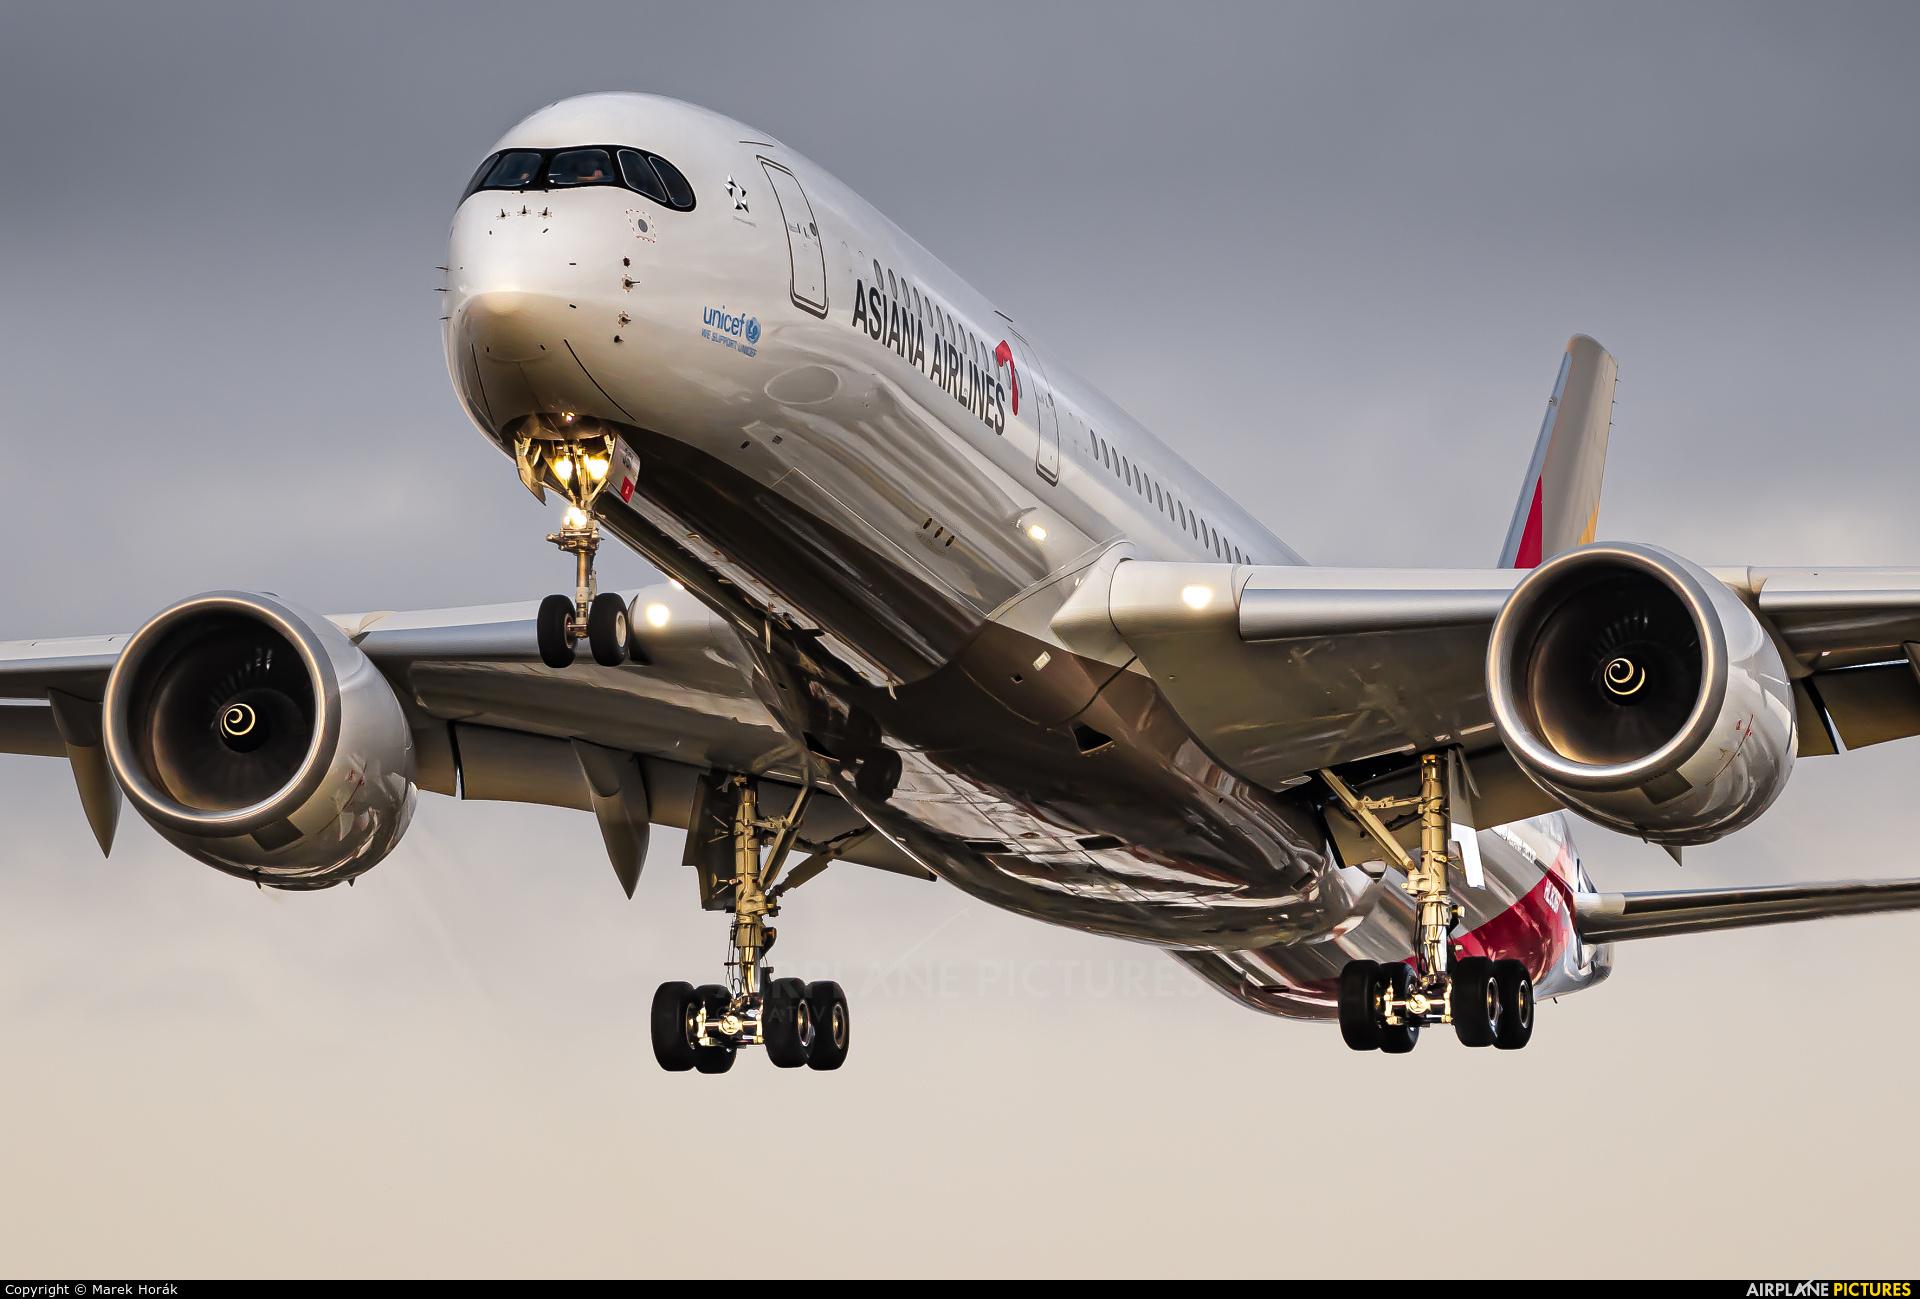 Asiana Airlines HL8361 aircraft at London - Heathrow